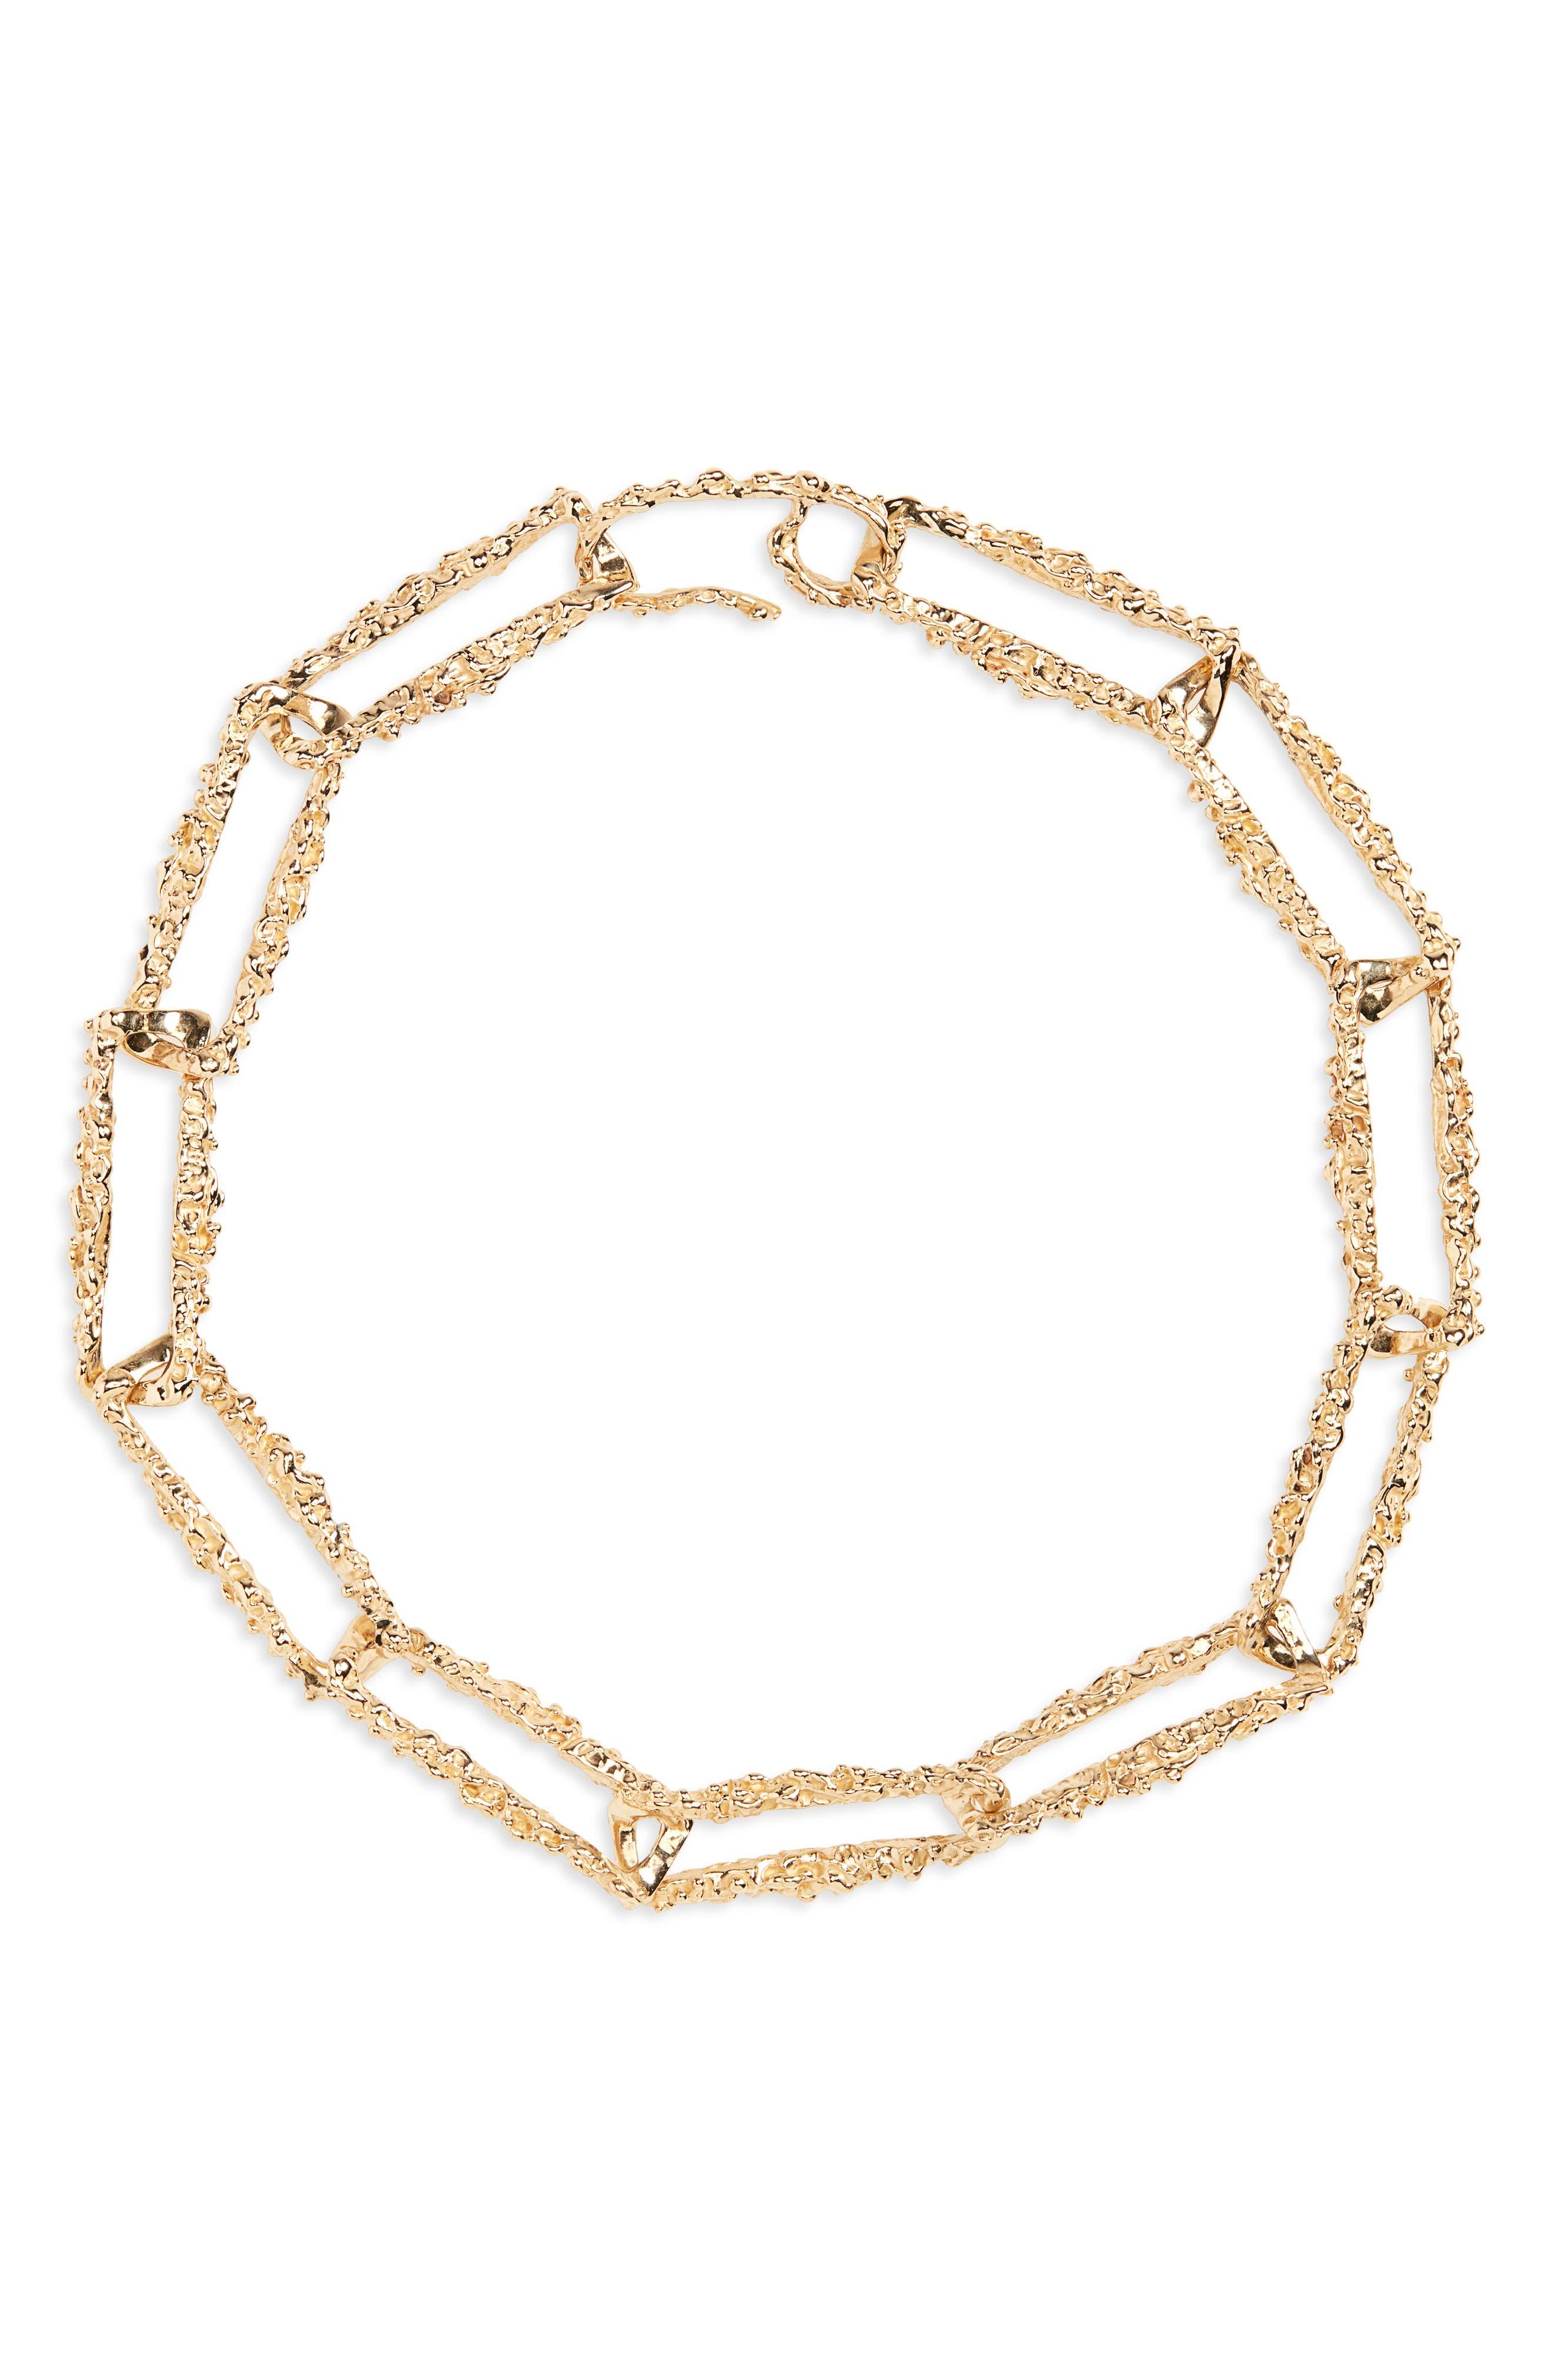 Roca Chain Link Necklace